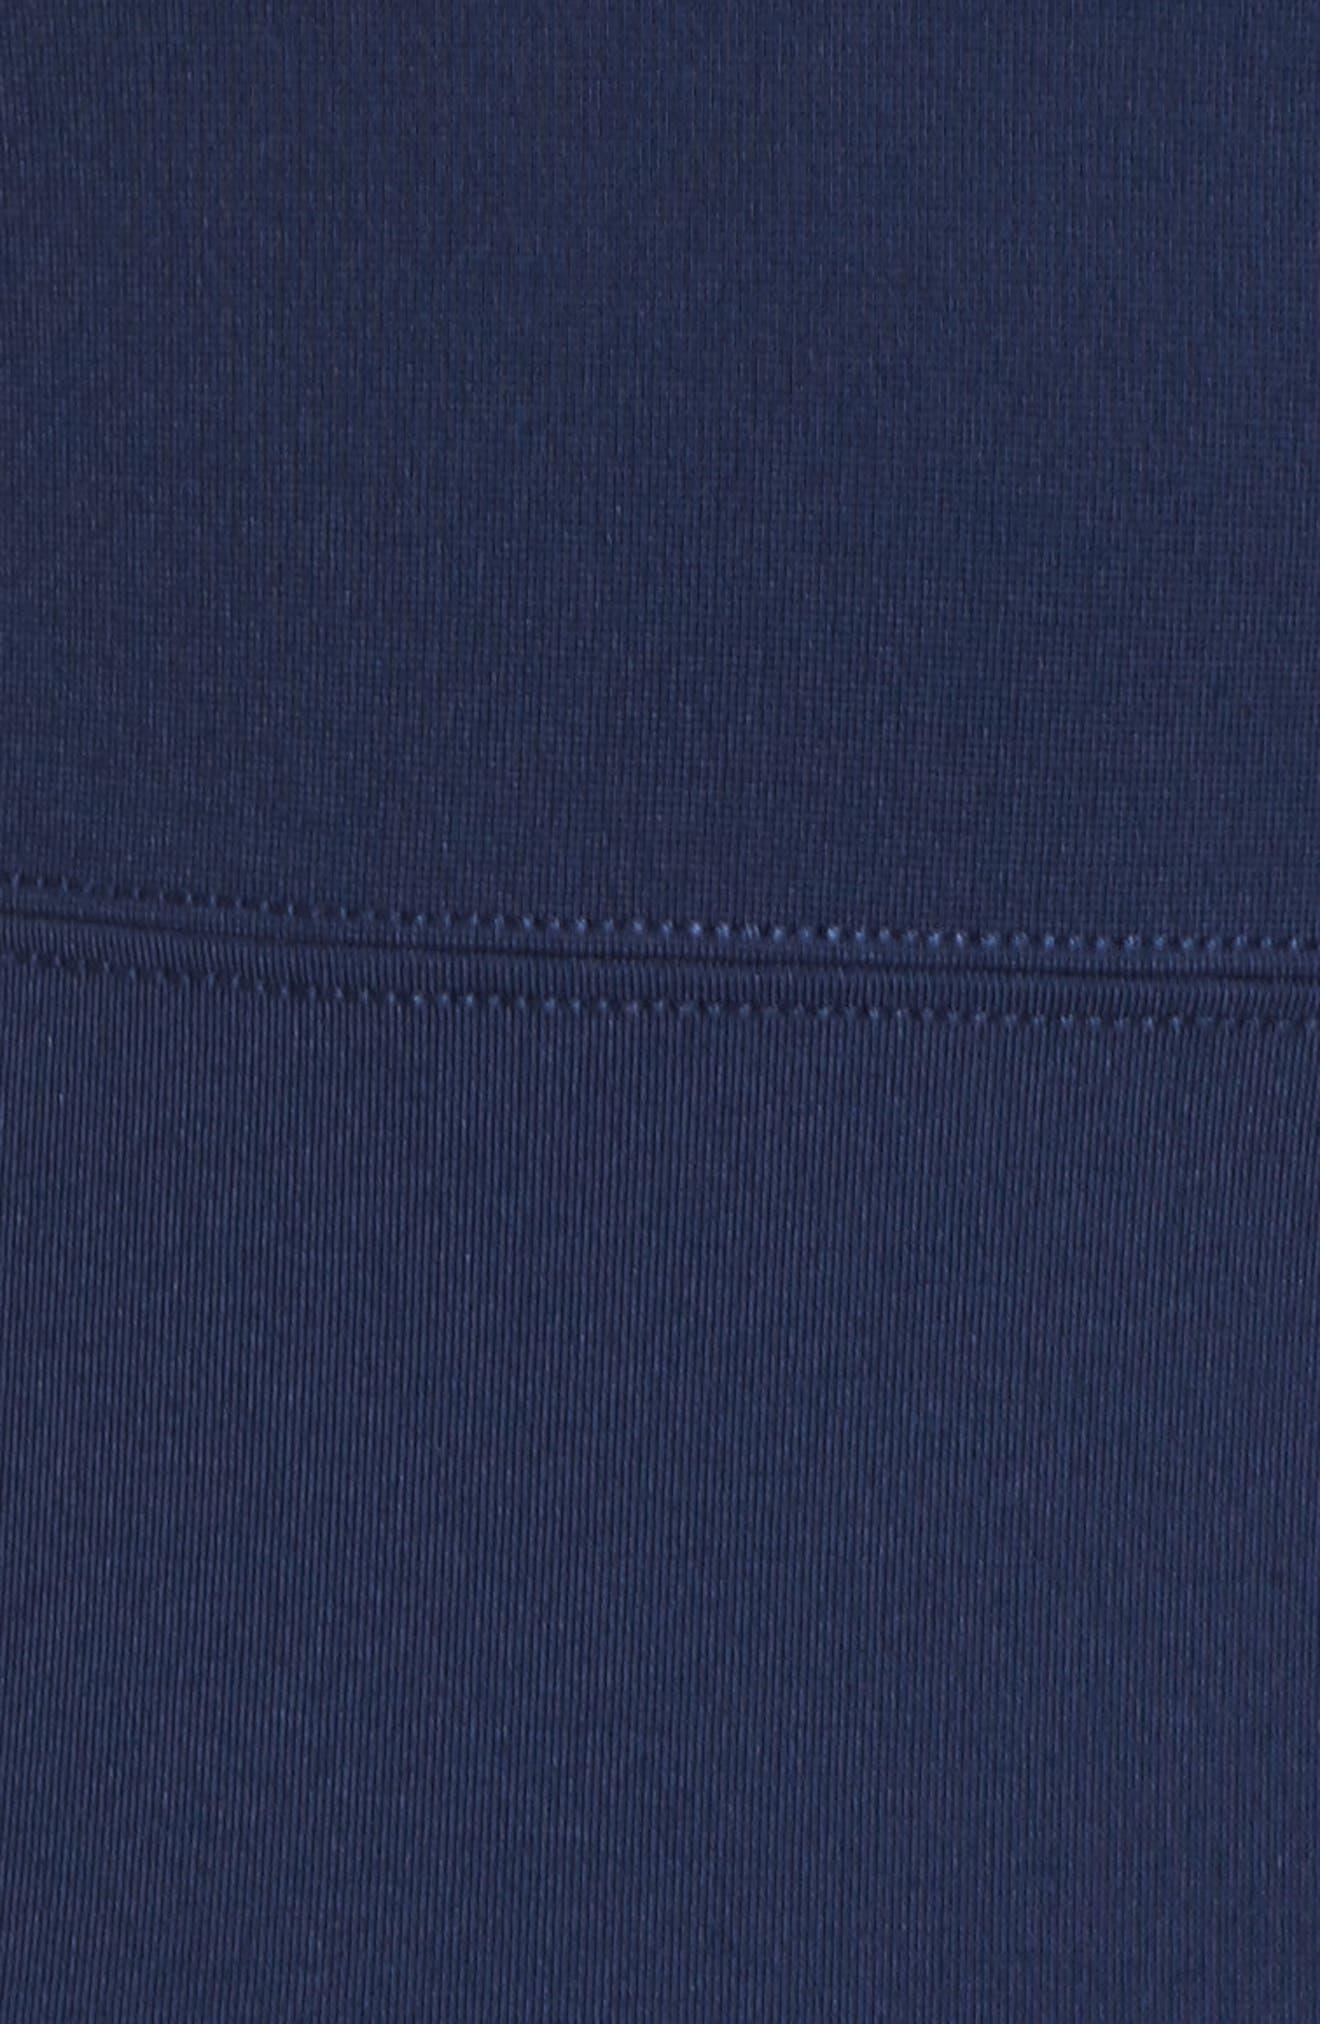 Lace Back Fit & Flare Dress,                             Alternate thumbnail 5, color,                             400